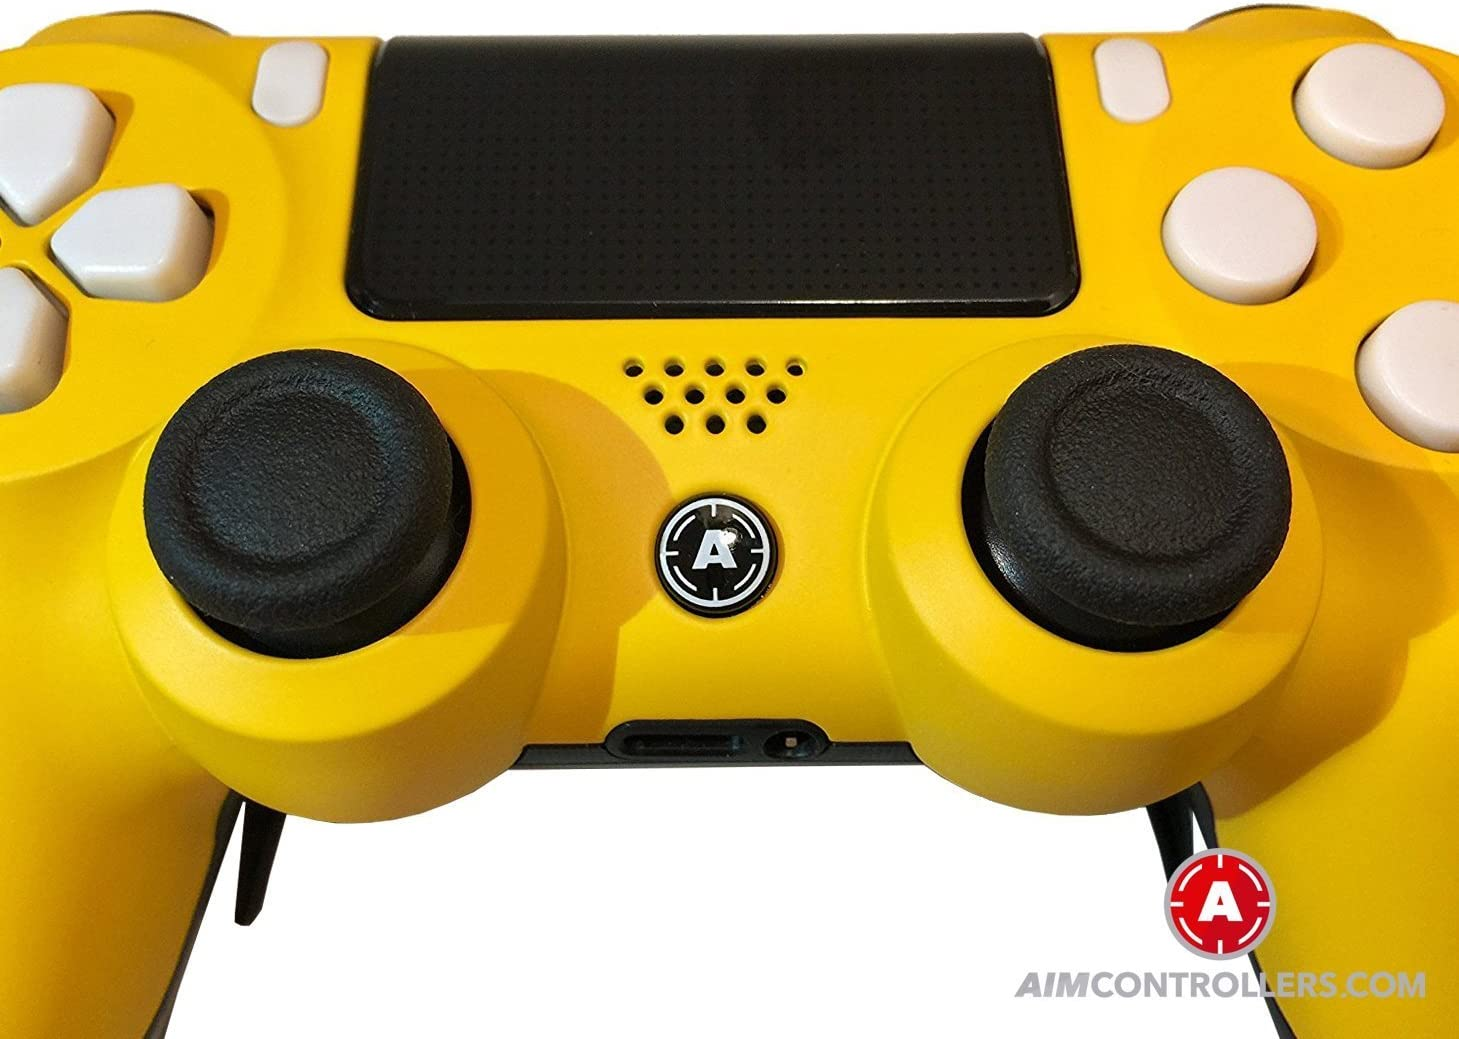 PS4 Slim DualShock 4 PlayStation 4 Wireless Controller - Custom AimController Yellow Matt Design with Paddles. Left X, Right O: Amazon.es: Videojuegos